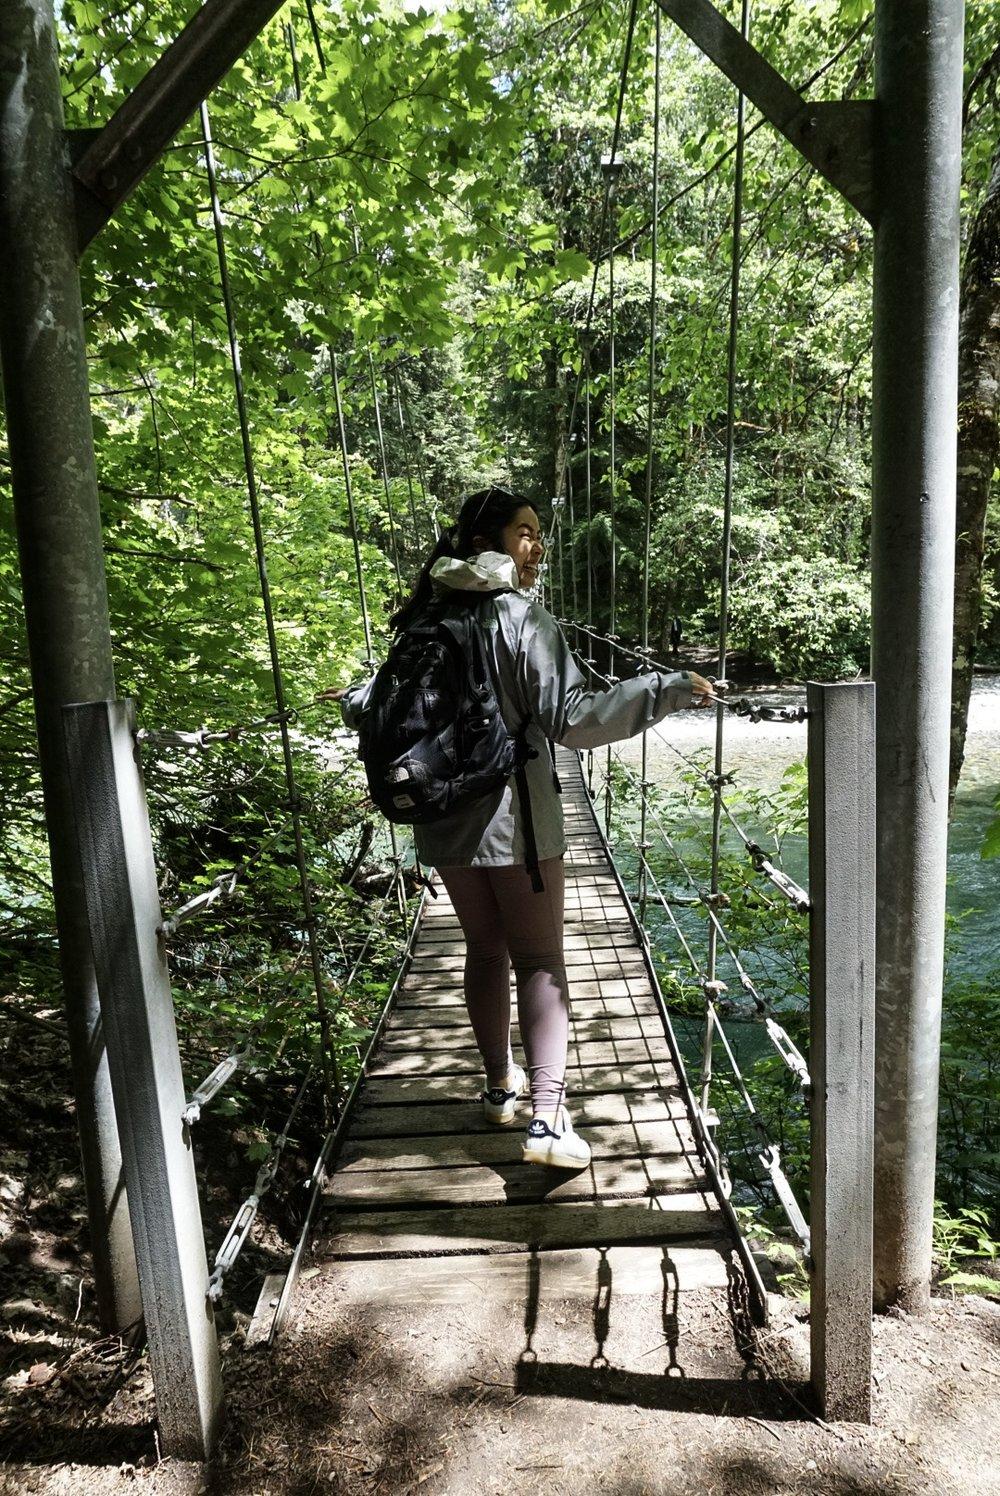 Jen on the Wobbly Bridge